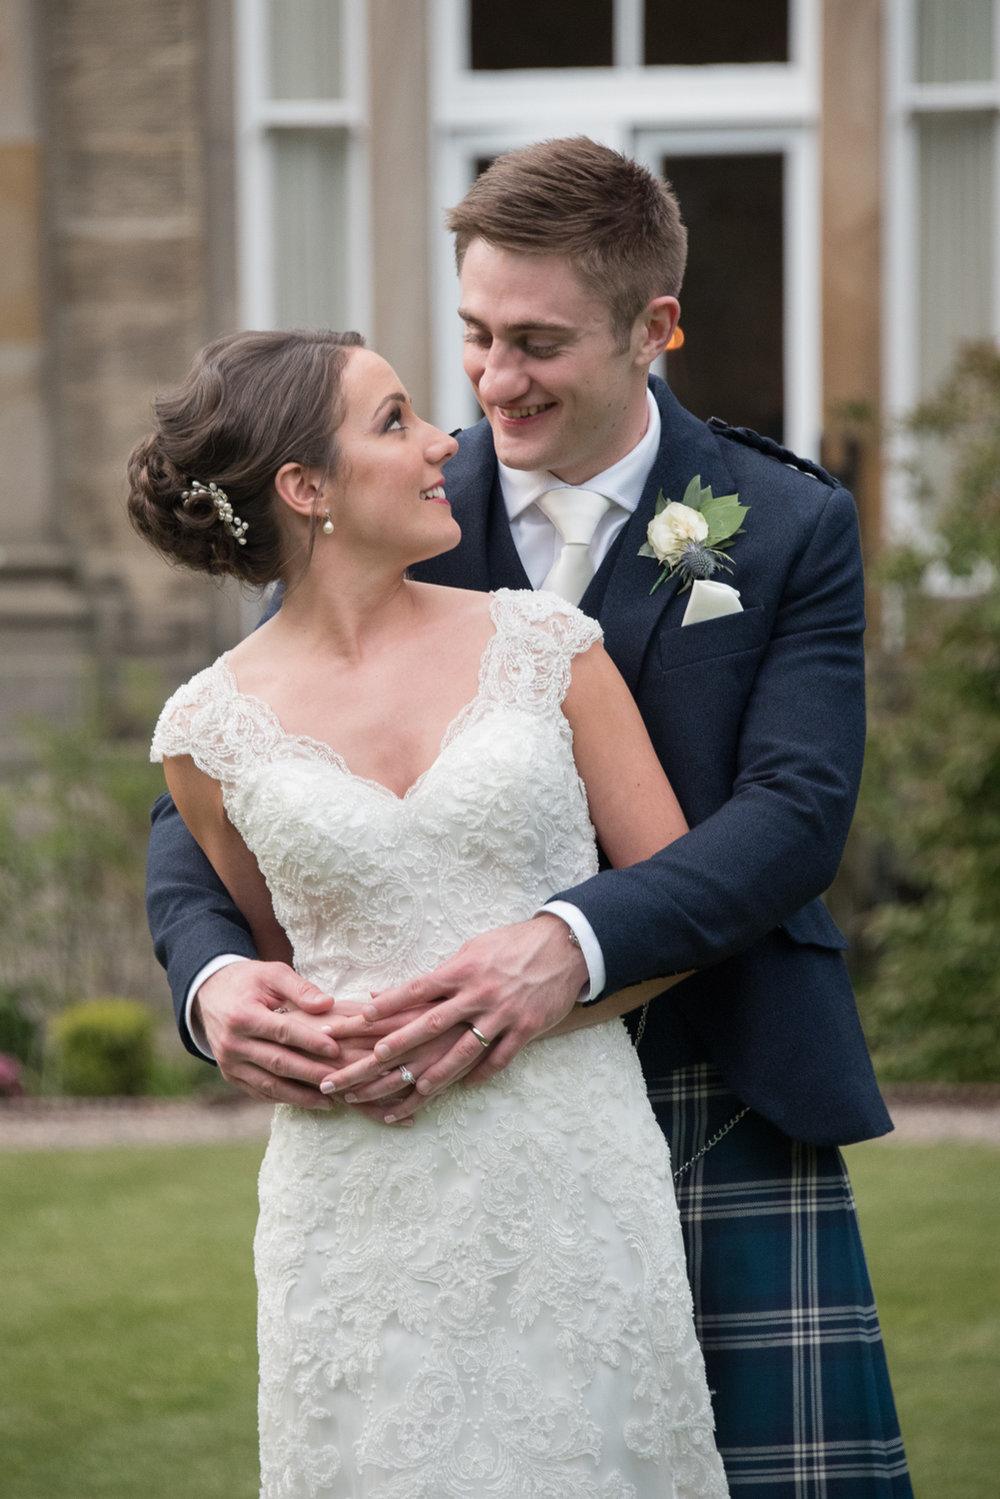 Wedding Photographer Edinburgh - Balbirnie